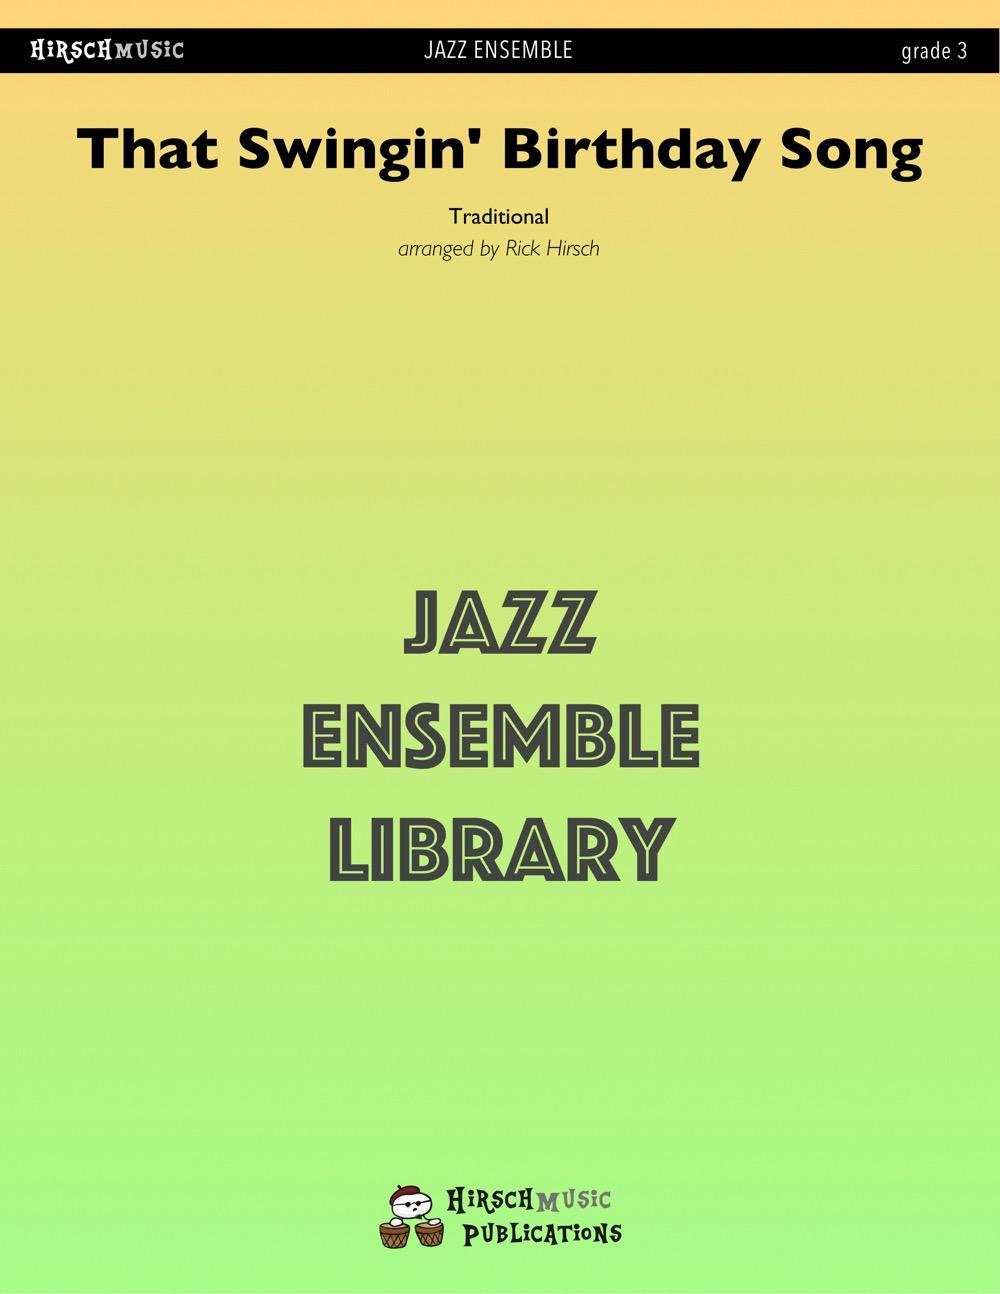 That Swingin' Birthday Song (Jazz Ensemble - Score and Parts)